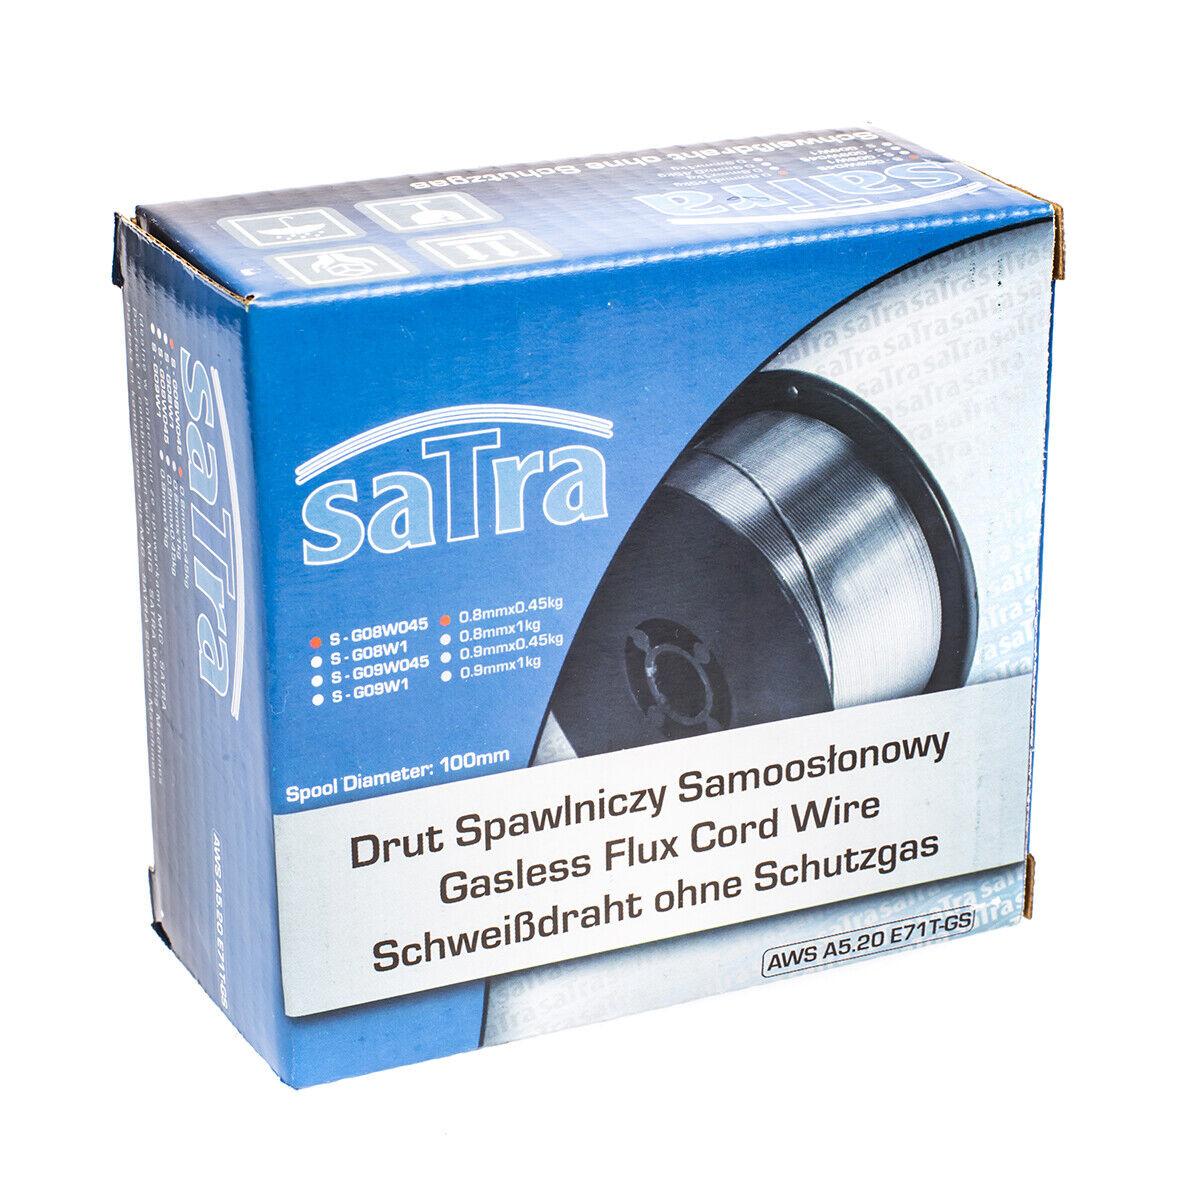 G09W045 Gasless Welding Wire MIG 0.9mm Flux Cored 0.45kg Reel AWS A5.20 E71T-GS